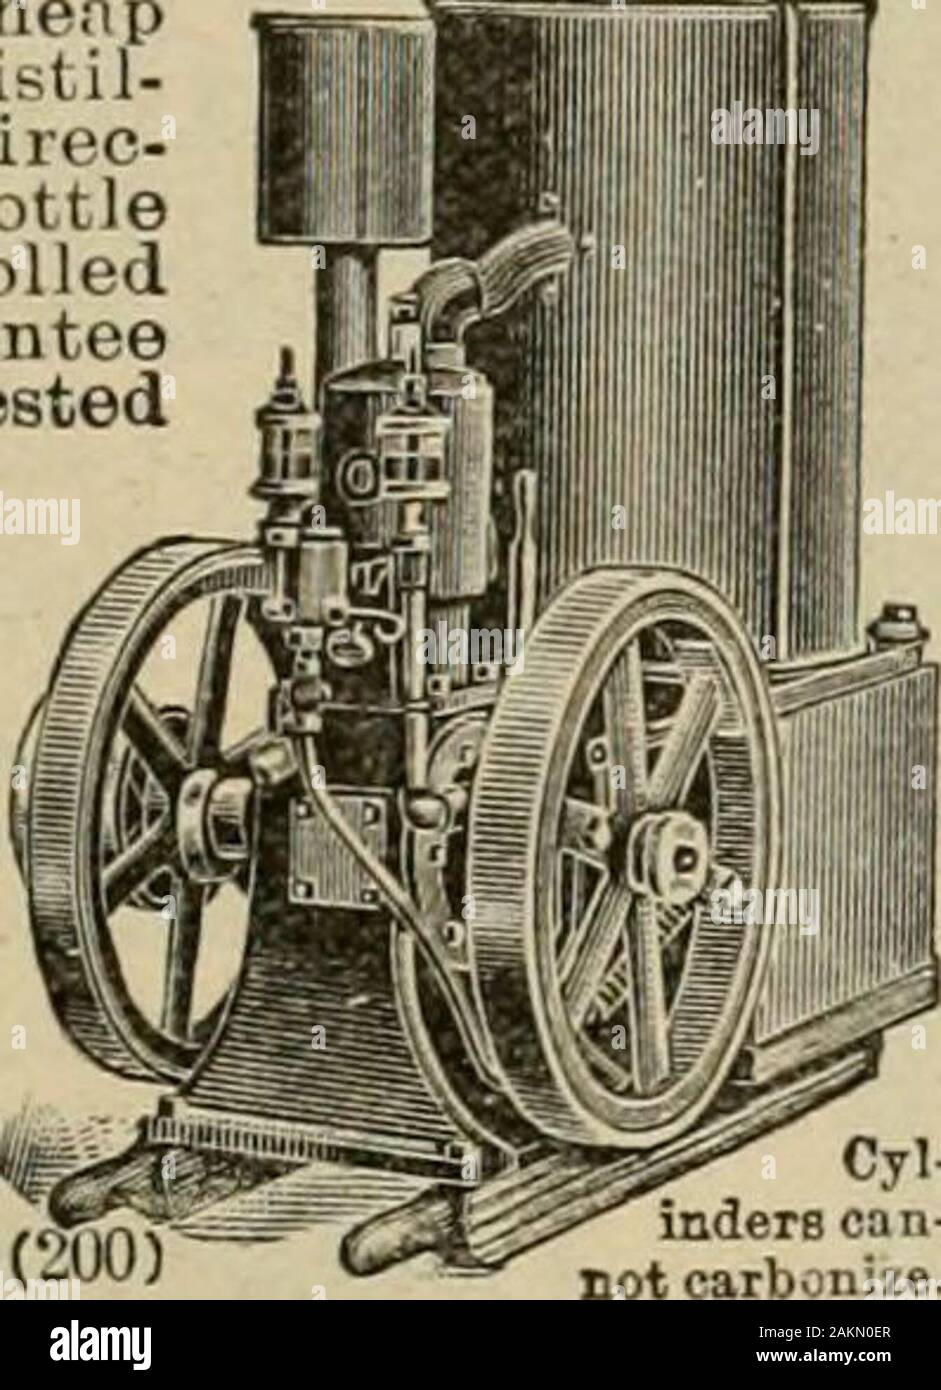 Weber Engine Co Water Governed Kerosene Engines Kansas City MO New Metal Sign